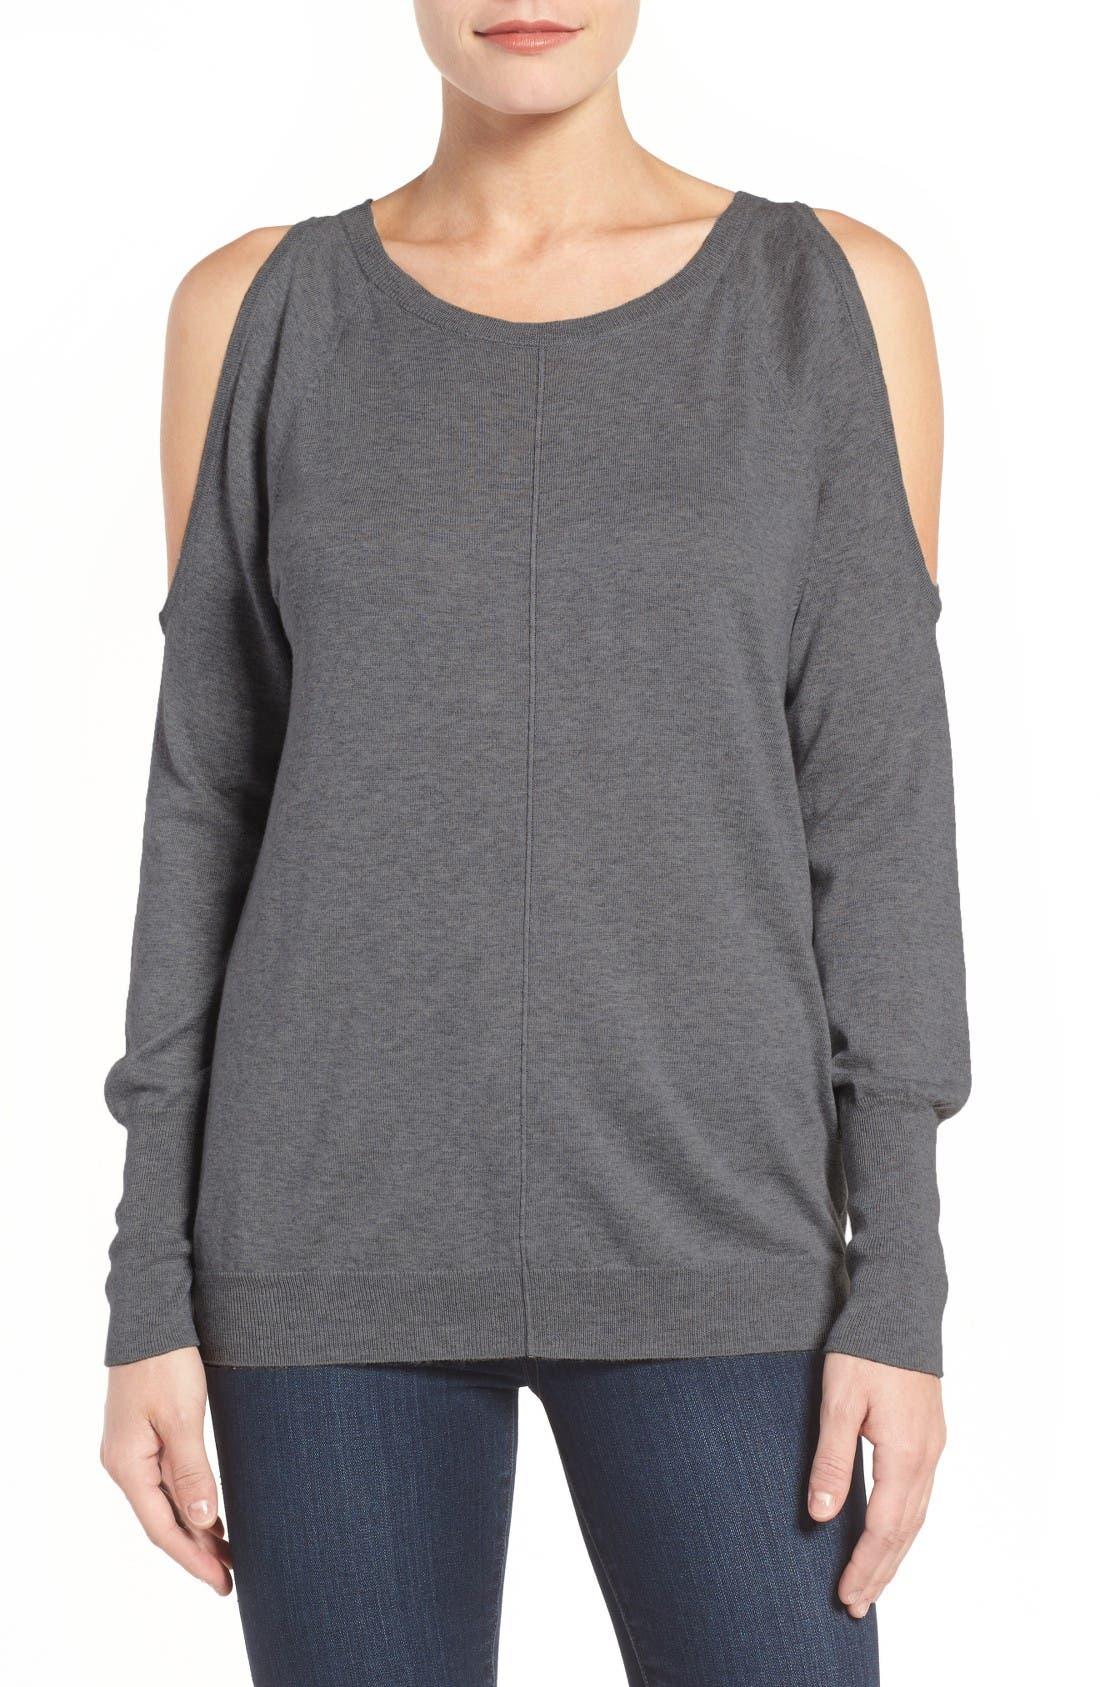 Alternate Image 1 Selected - Vince Camuto Cold Shoulder Sweater (Regular & Petite)